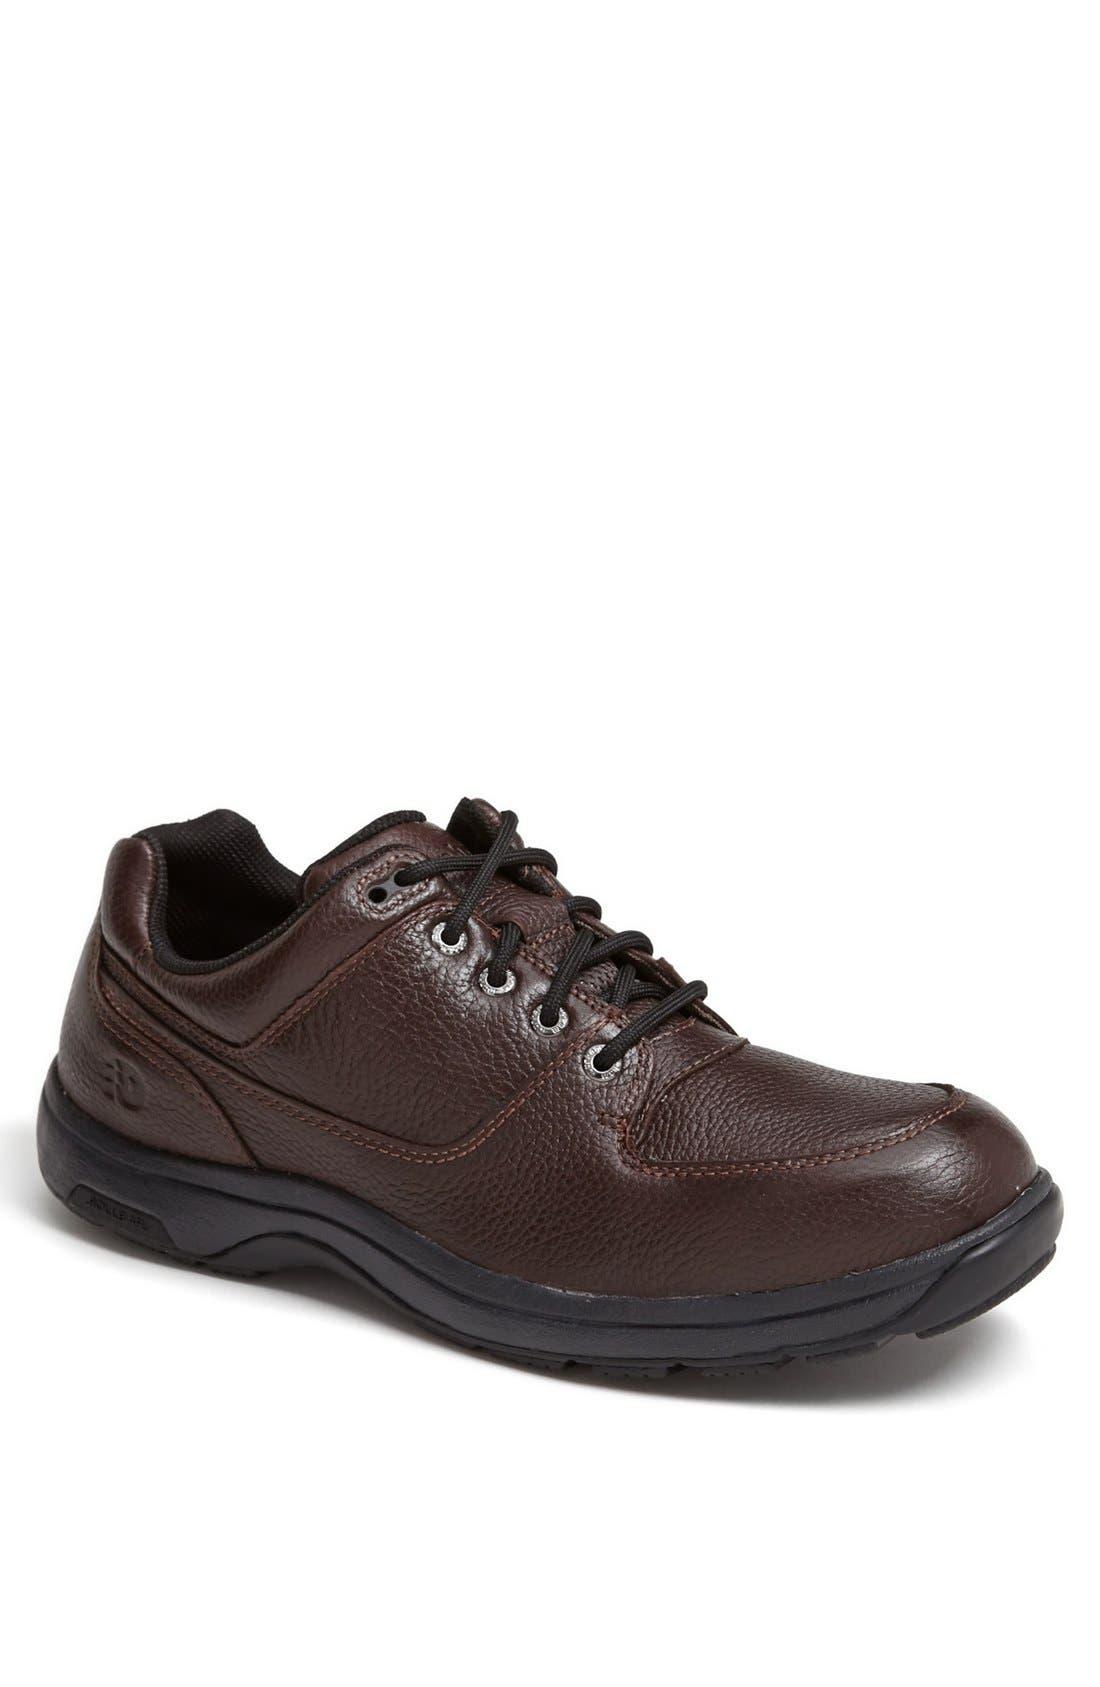 Main Image - Dunham 'Windsor' Sneaker